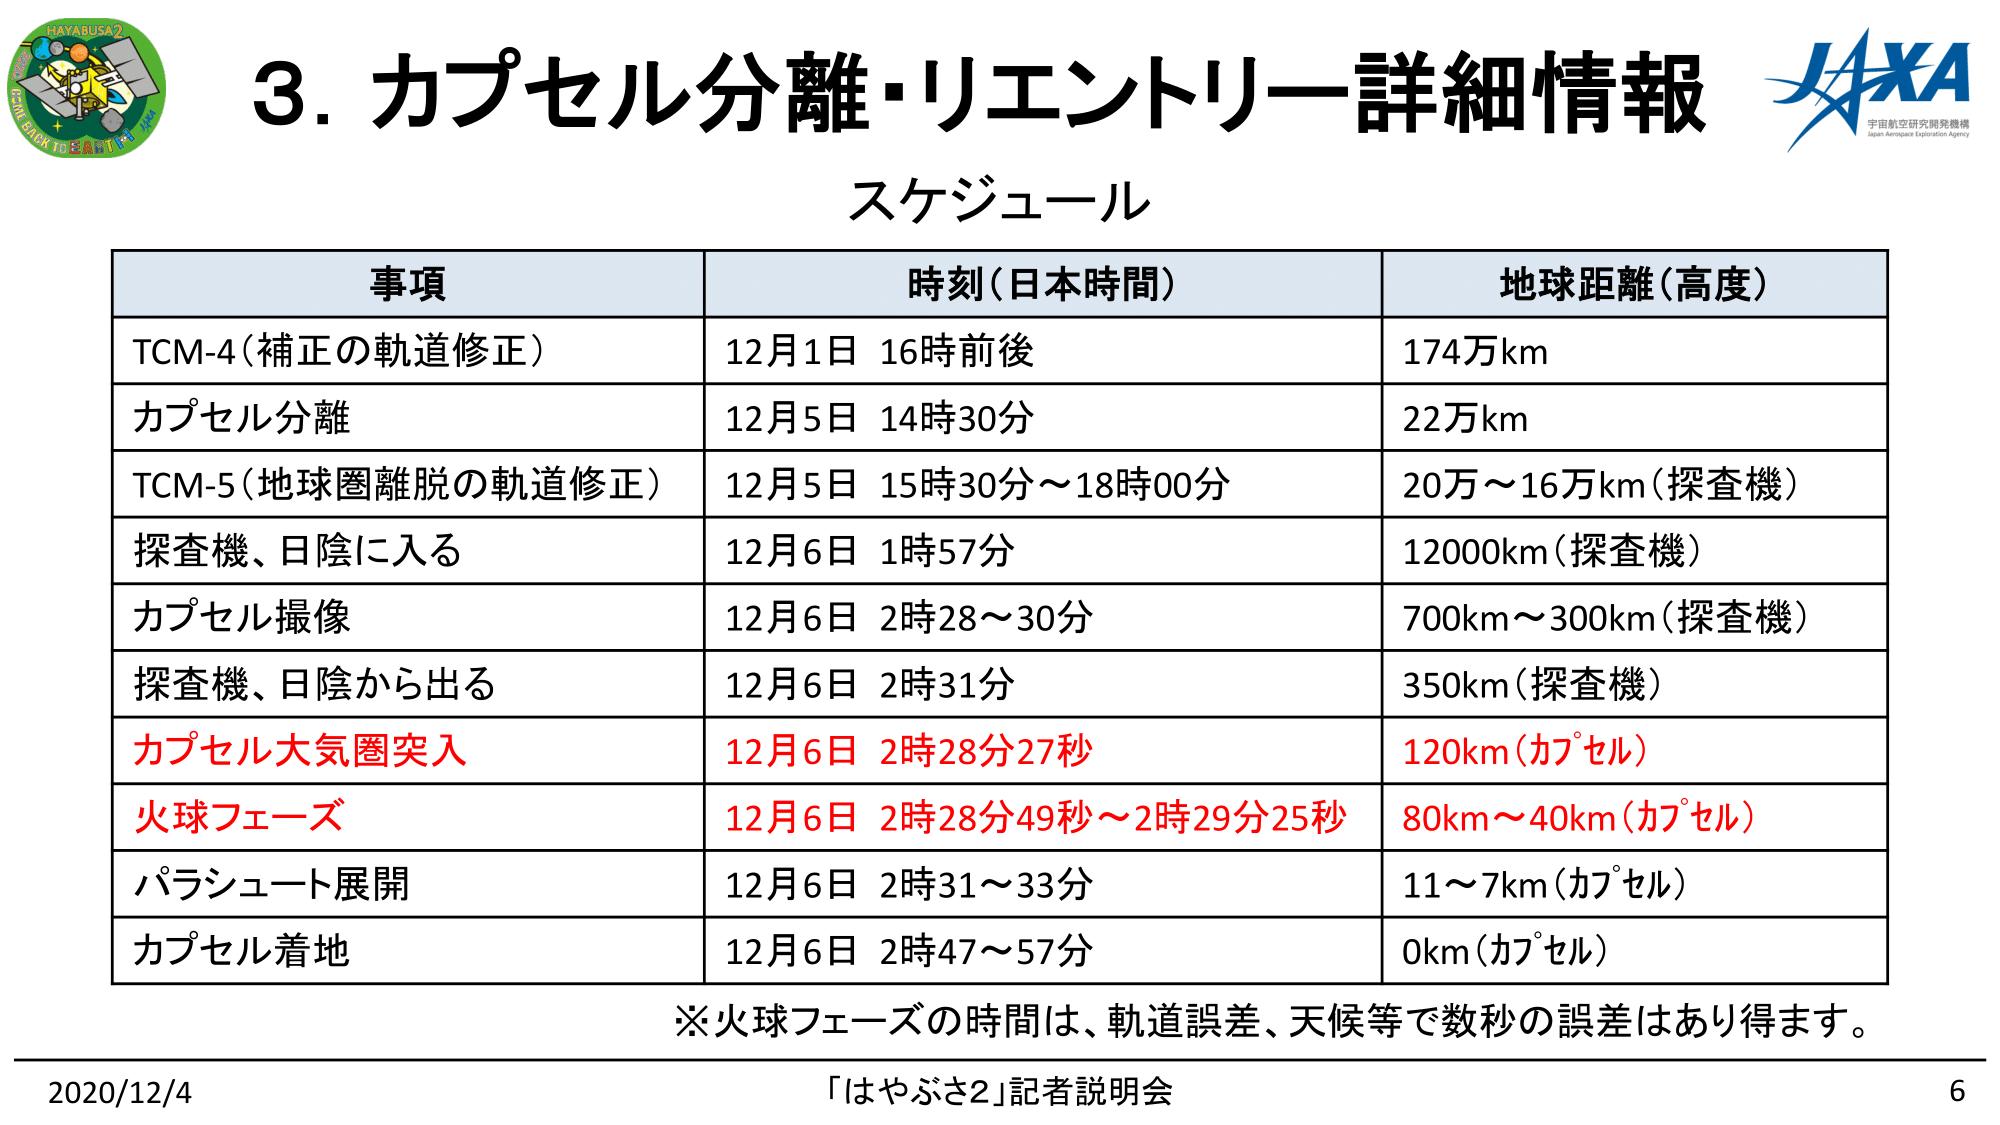 f:id:Imamura:20201204153756p:plain